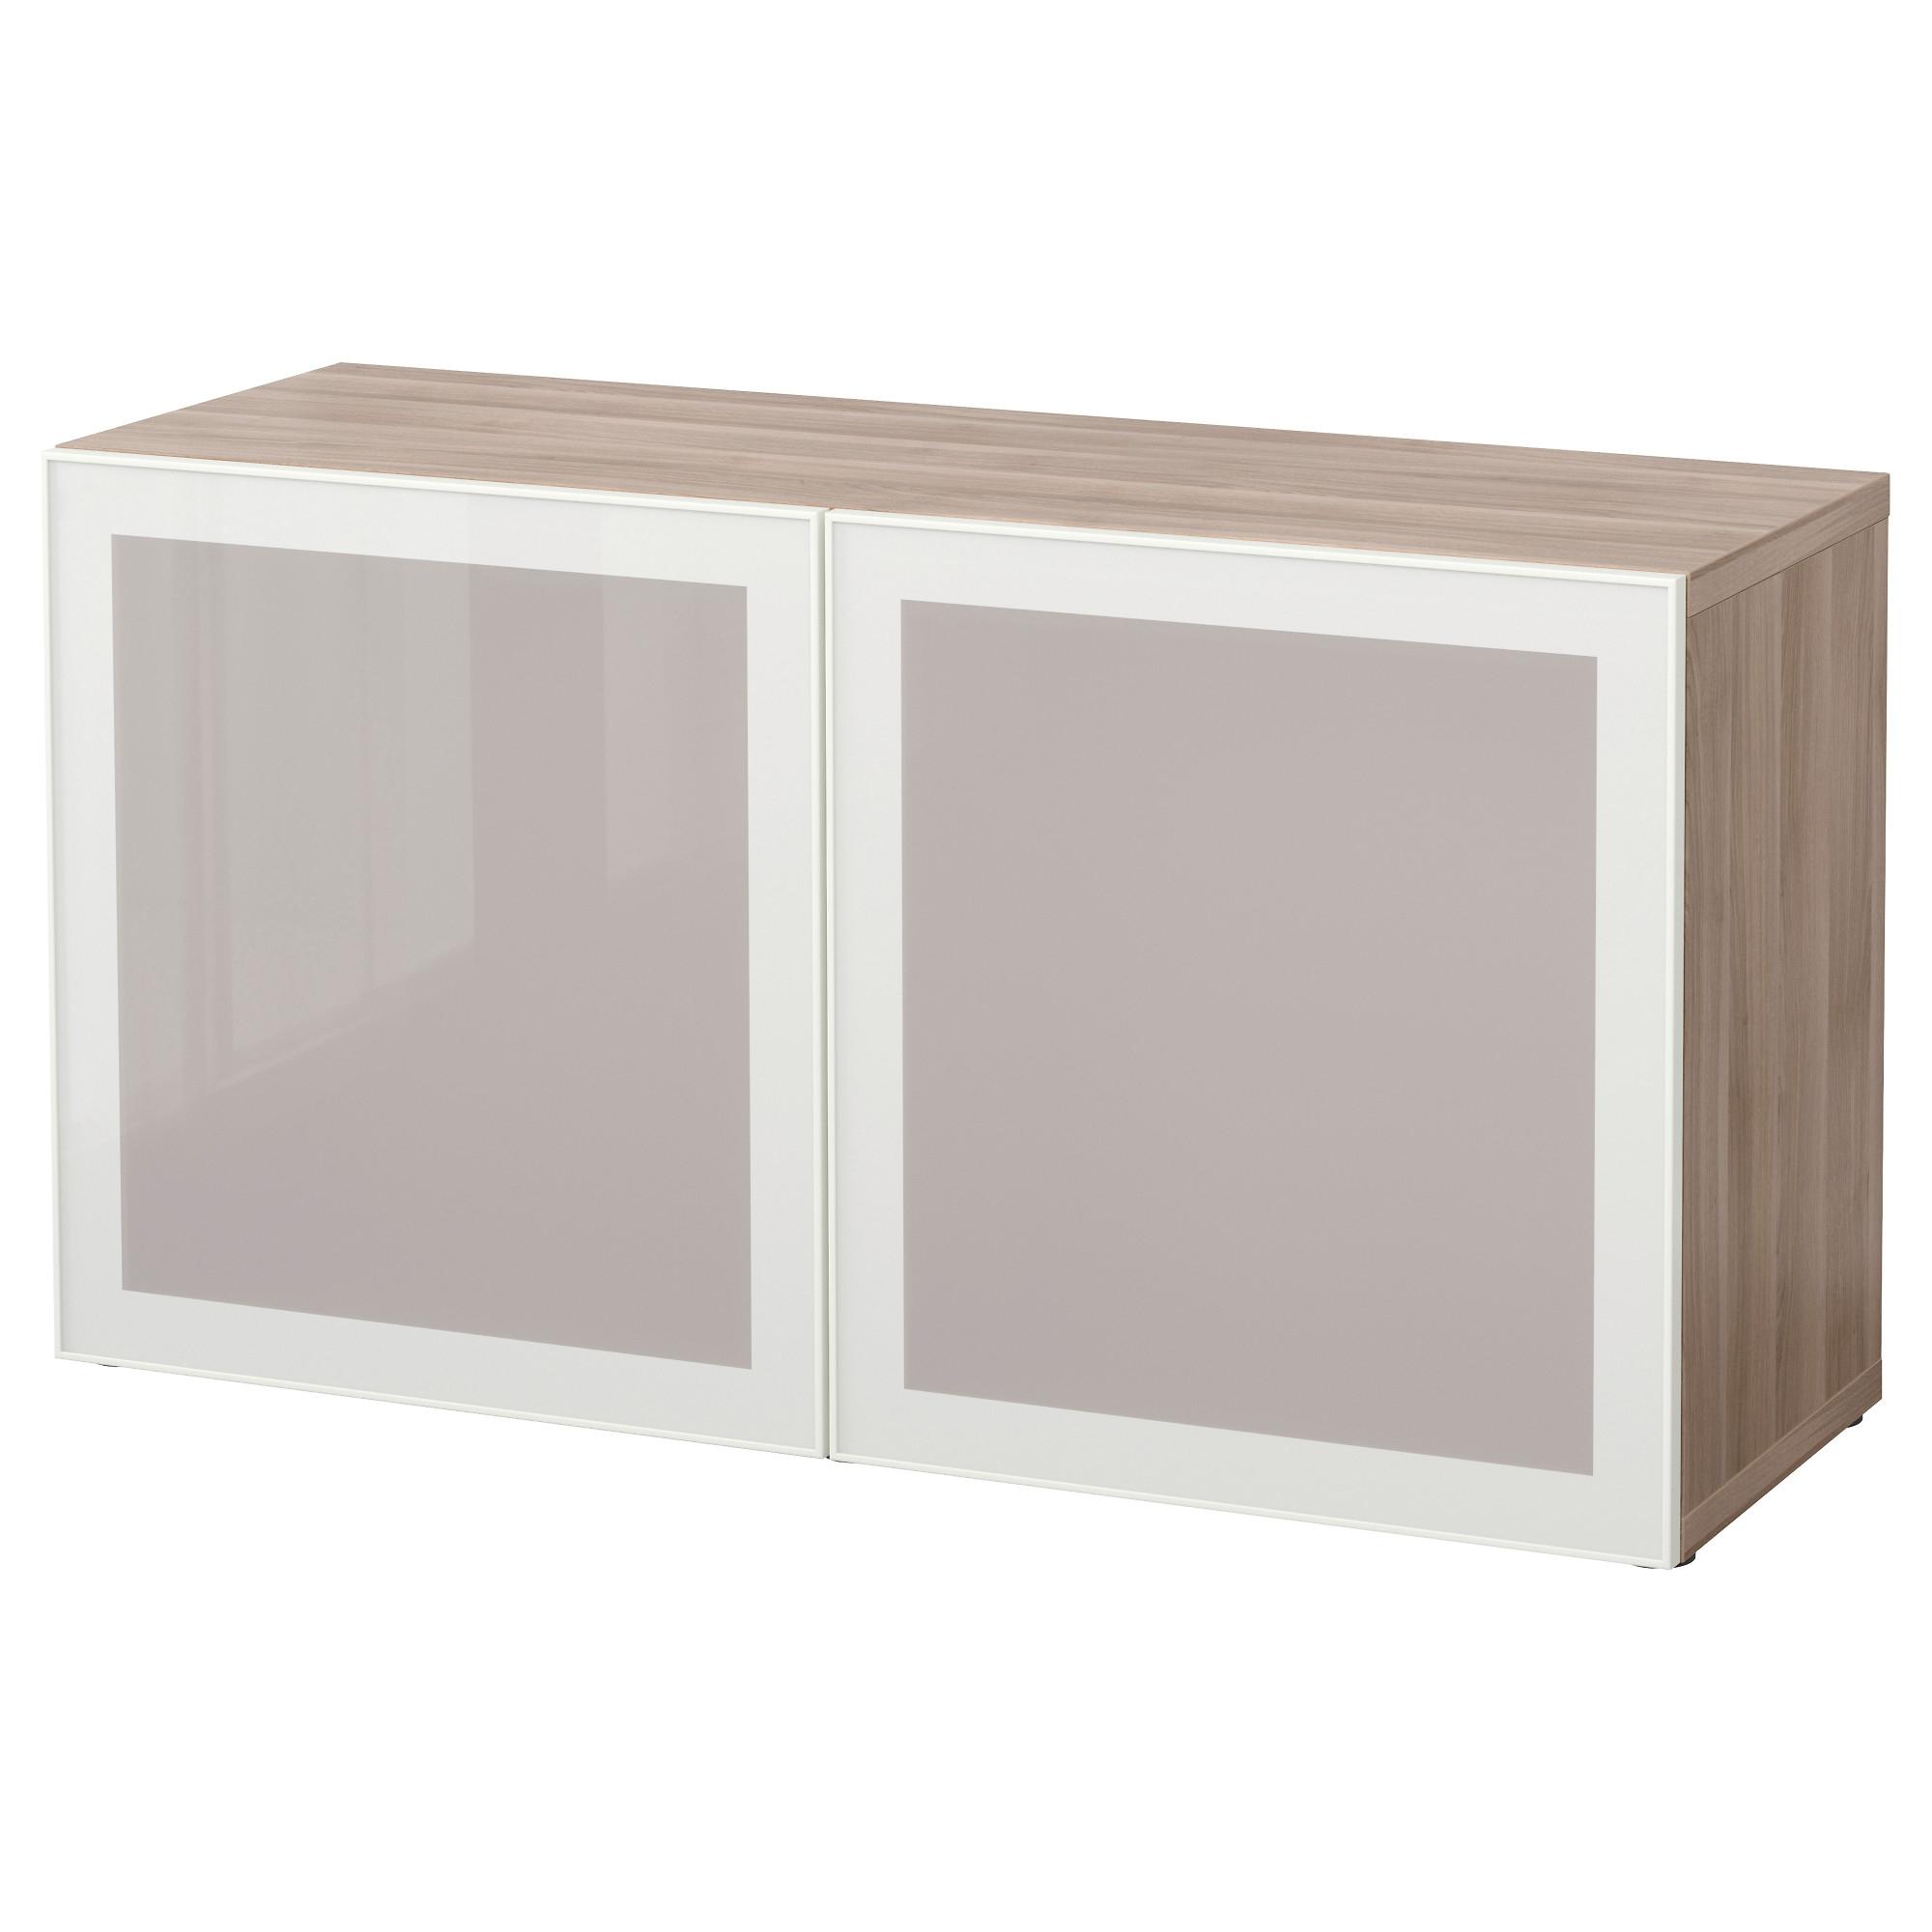 Best Shelf Unit With Glass Doors